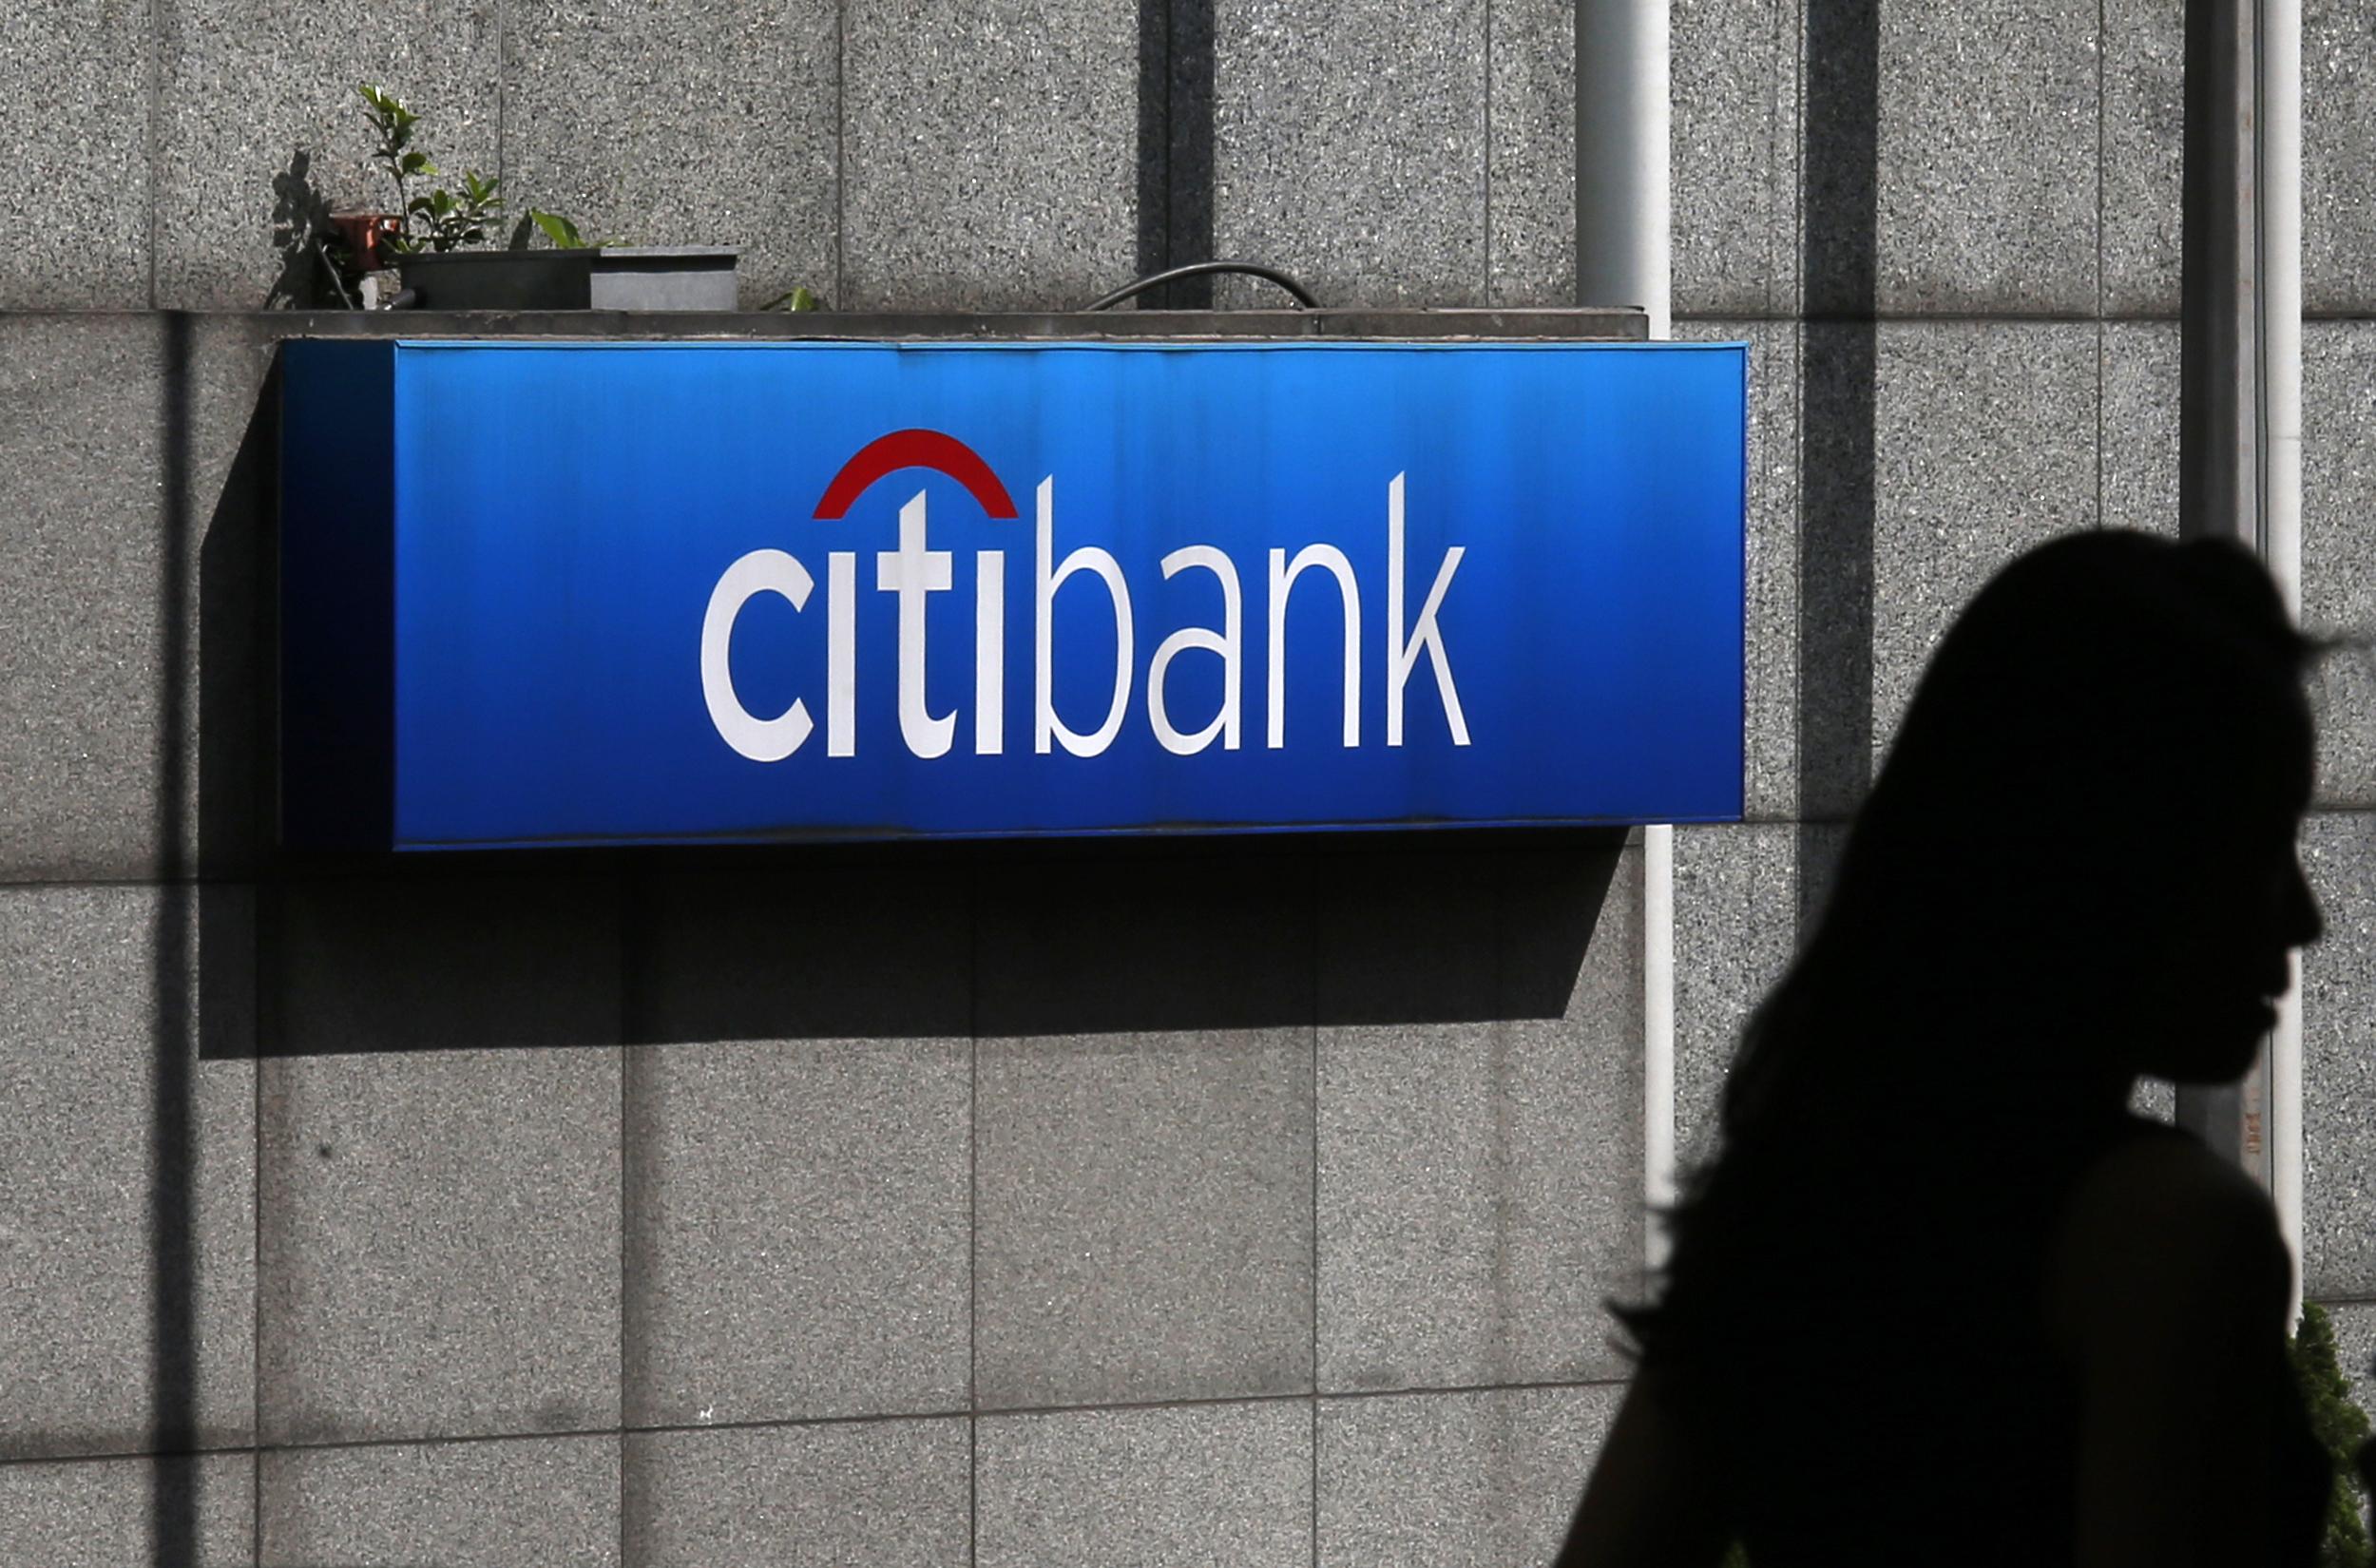 A woman walks past a Citibank logo